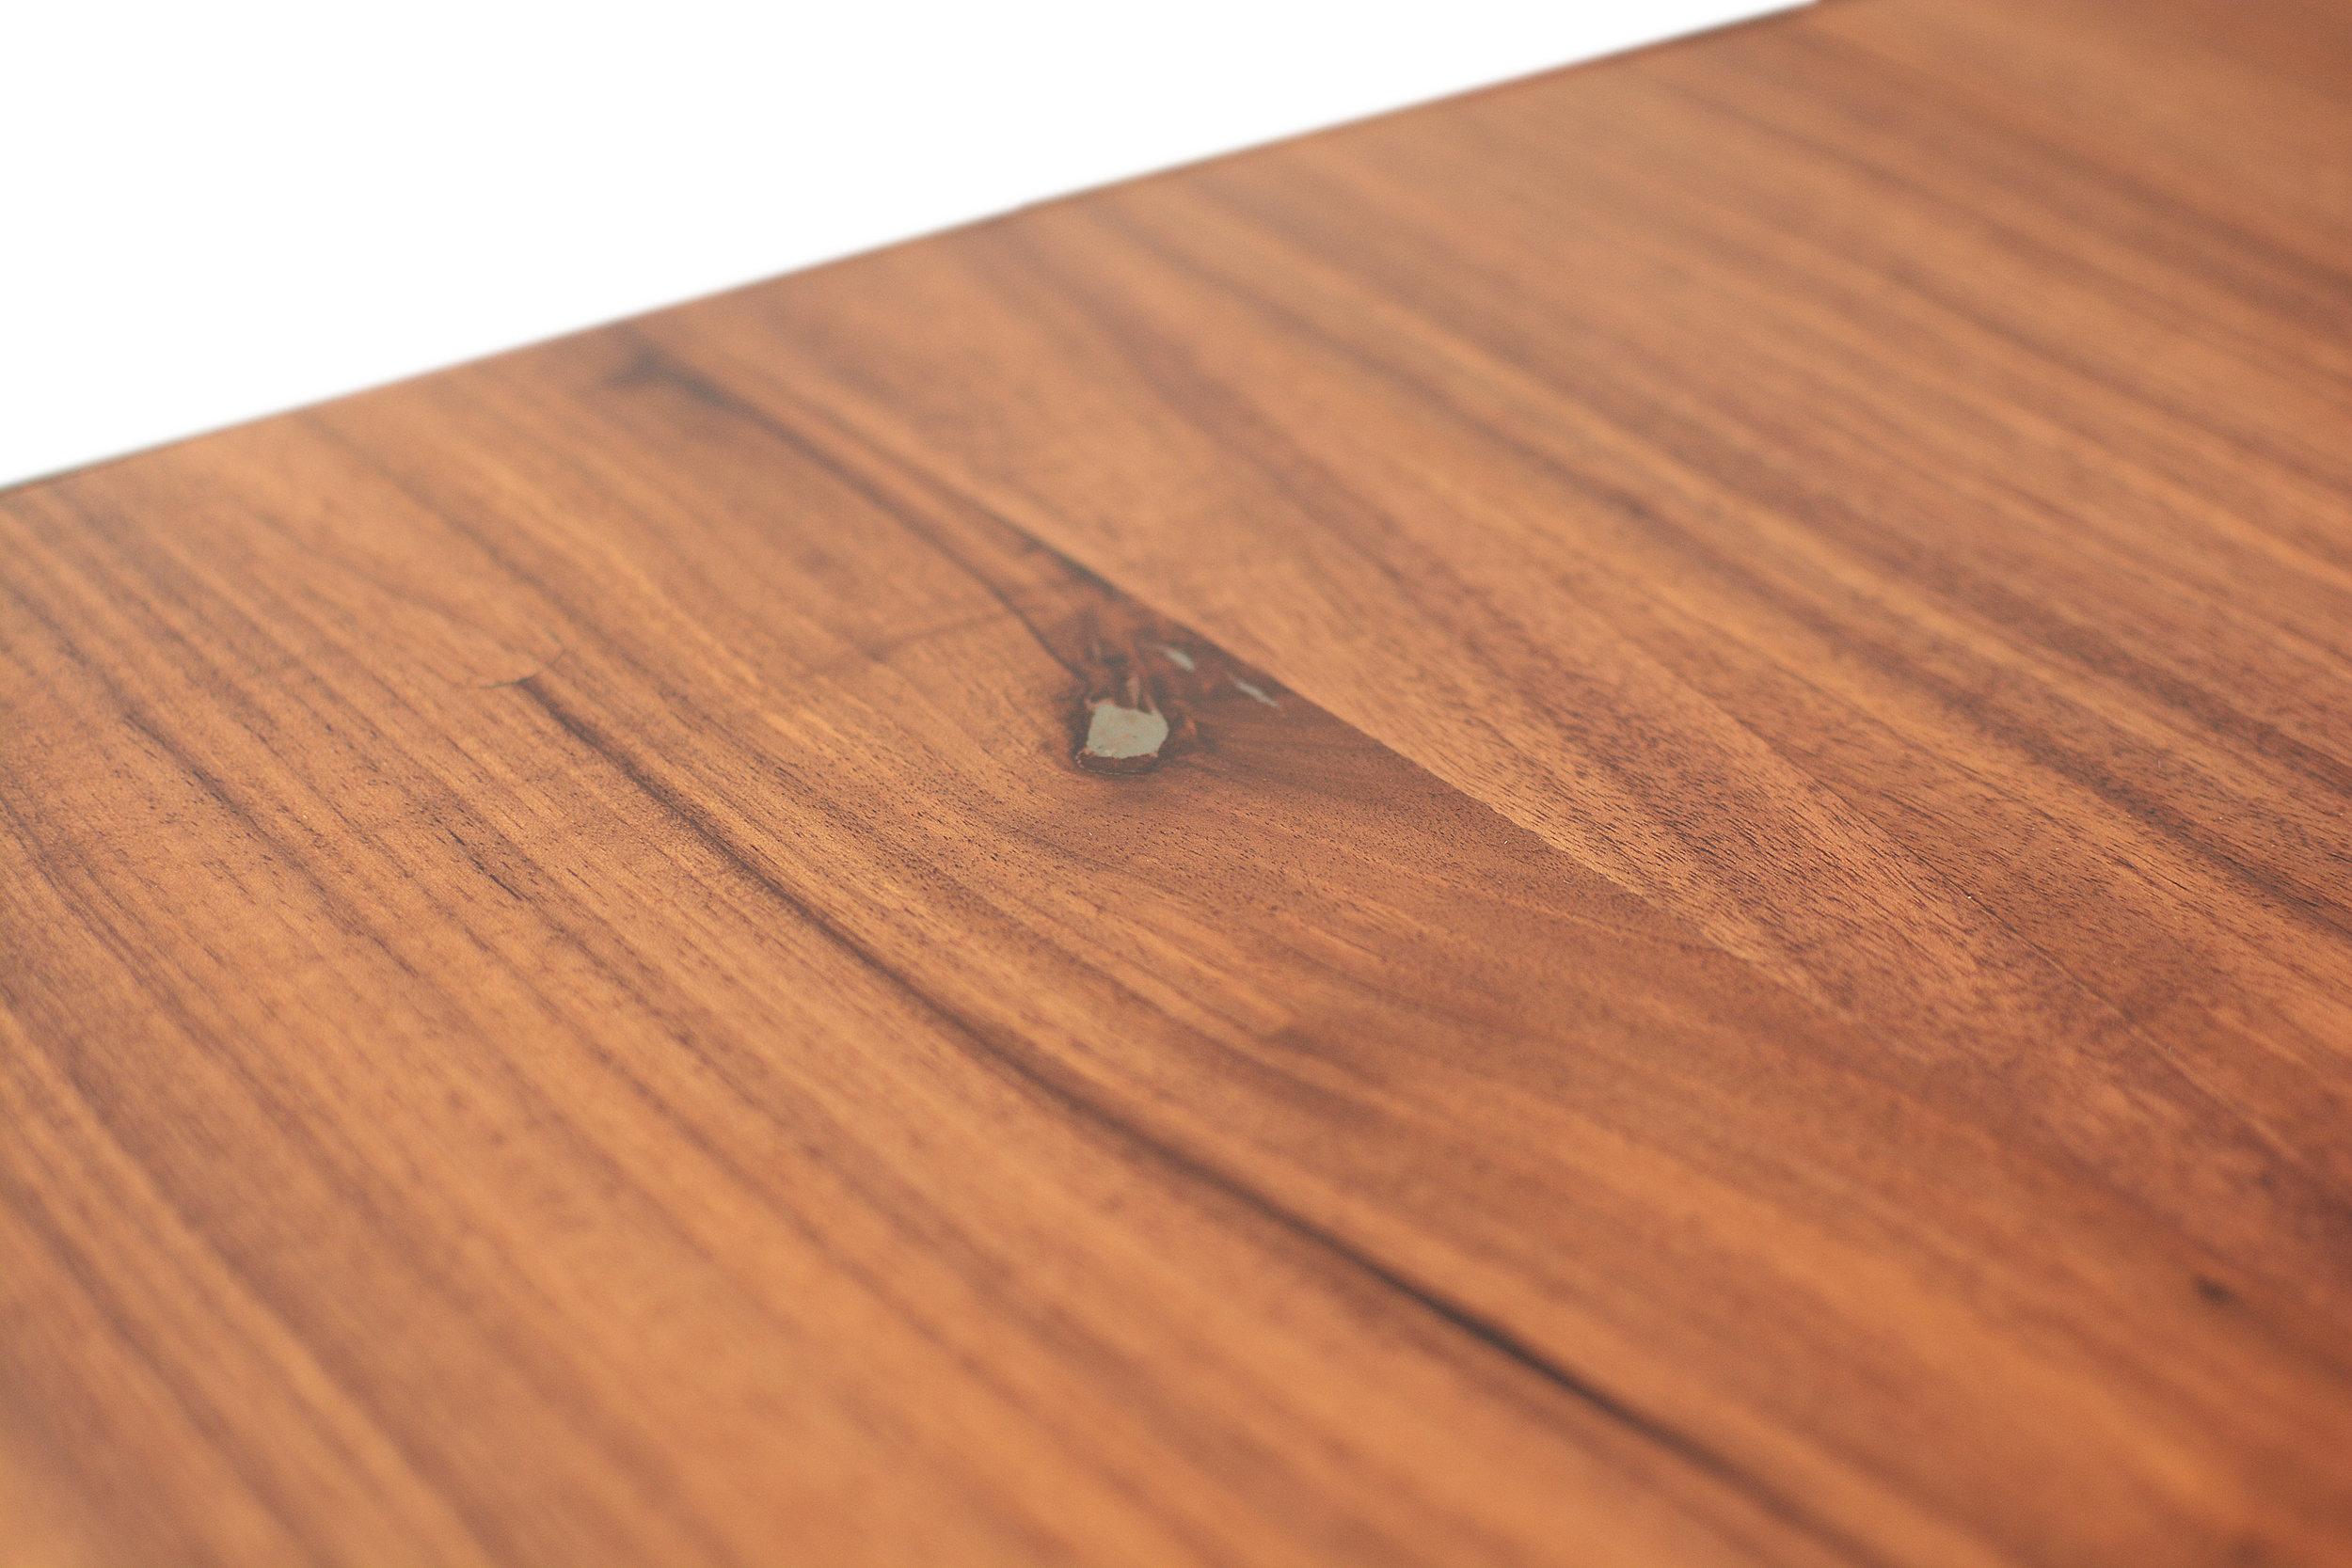 Etz & Steel Hermes Live Edge Walnut Table Close Up 2.JPG